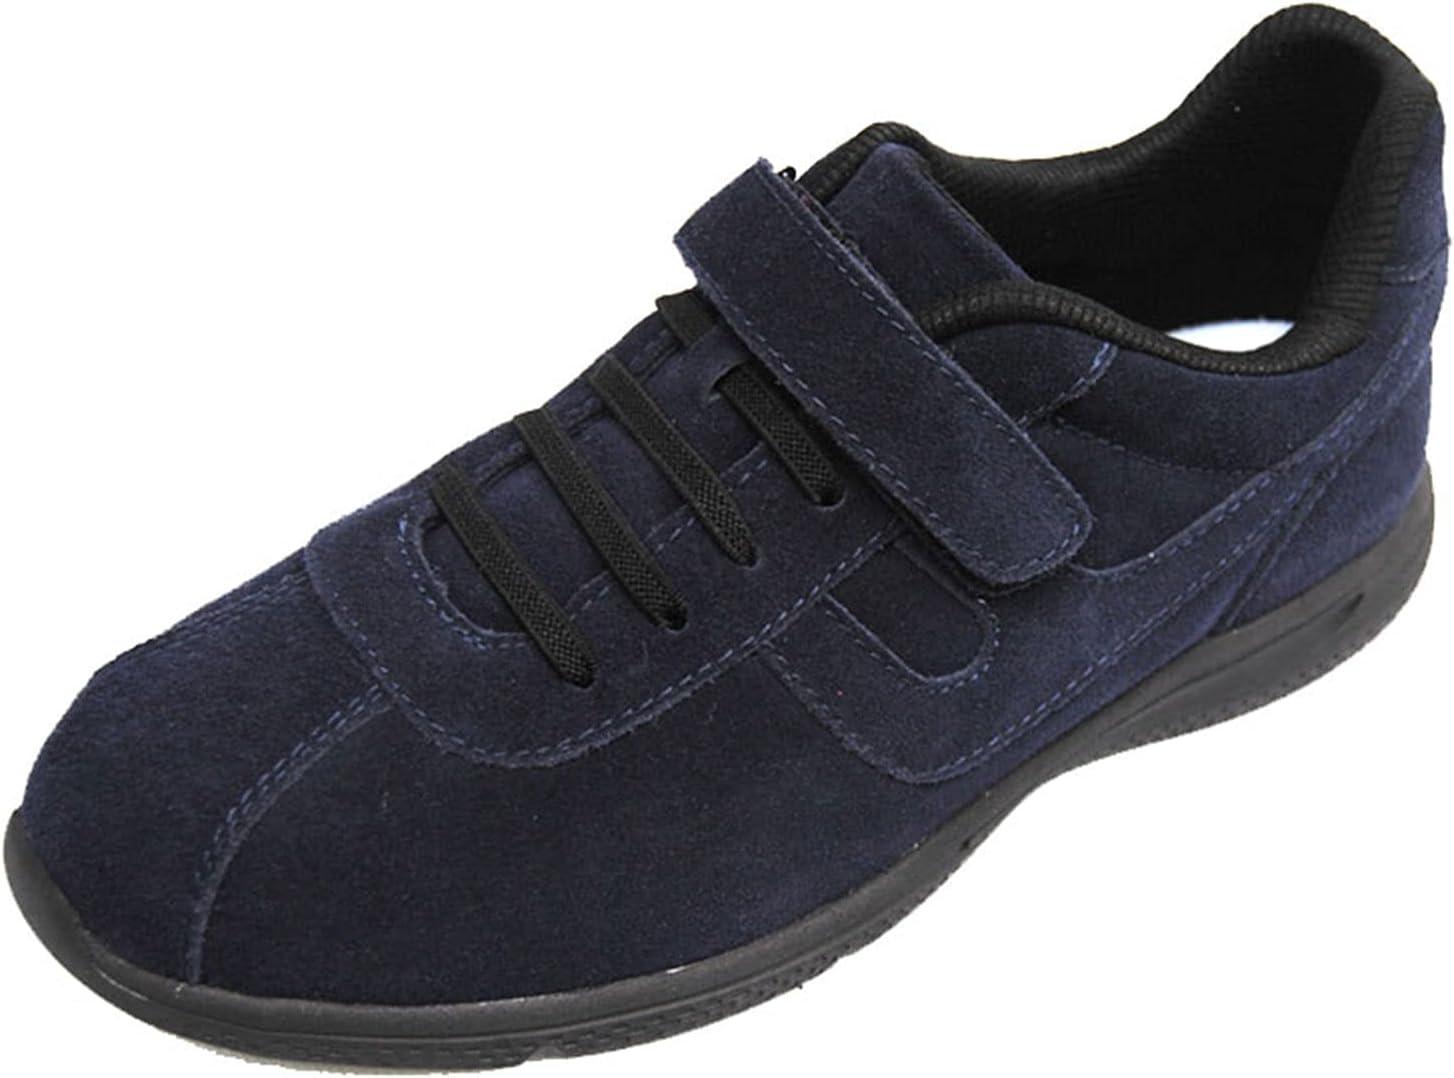 Women Diabetic Edema Shoes Adjustable Air Minneapolis Mall Sneakers Cushion Industry No. 1 Elde